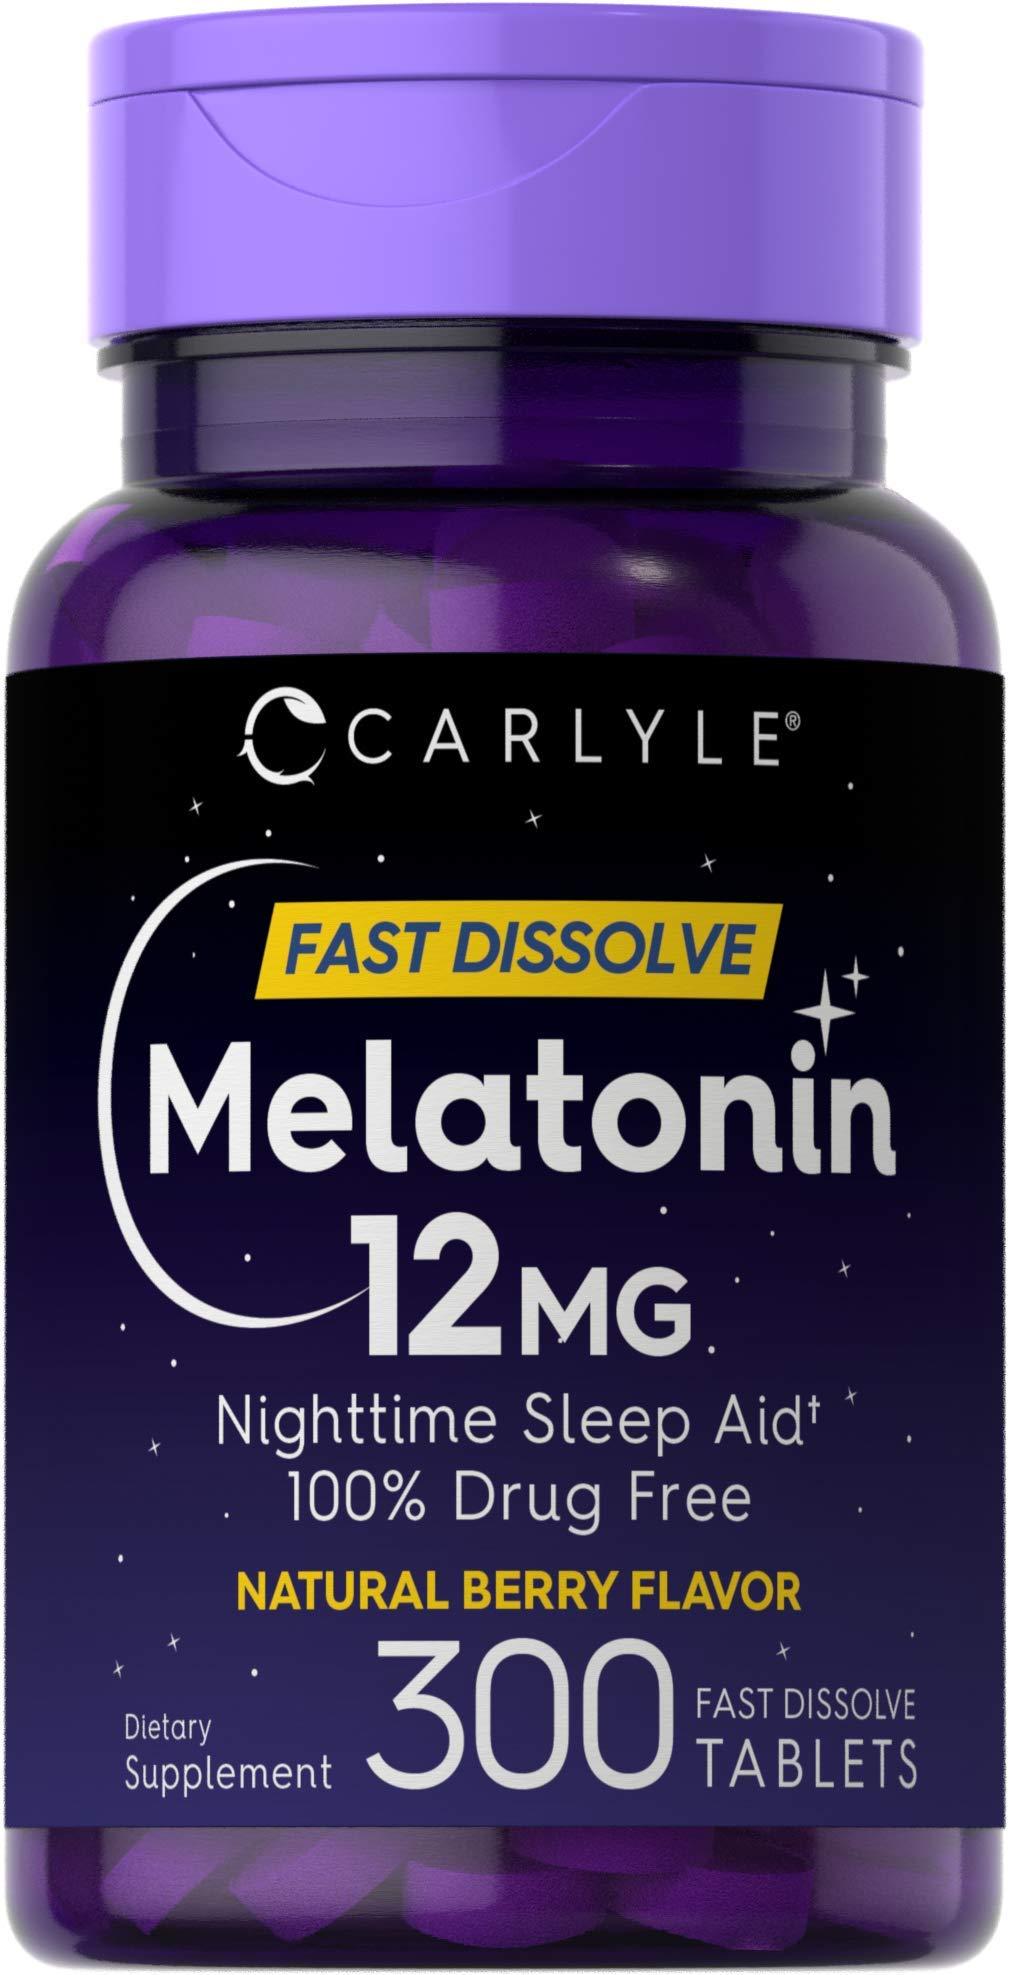 Carlyle Melatonin 12 mg Fast Dissolve 300 Tablets | Nighttime Sleep Aid | Natural Berry Flavor | Vegetarian, Non-GMO, Gluten Free